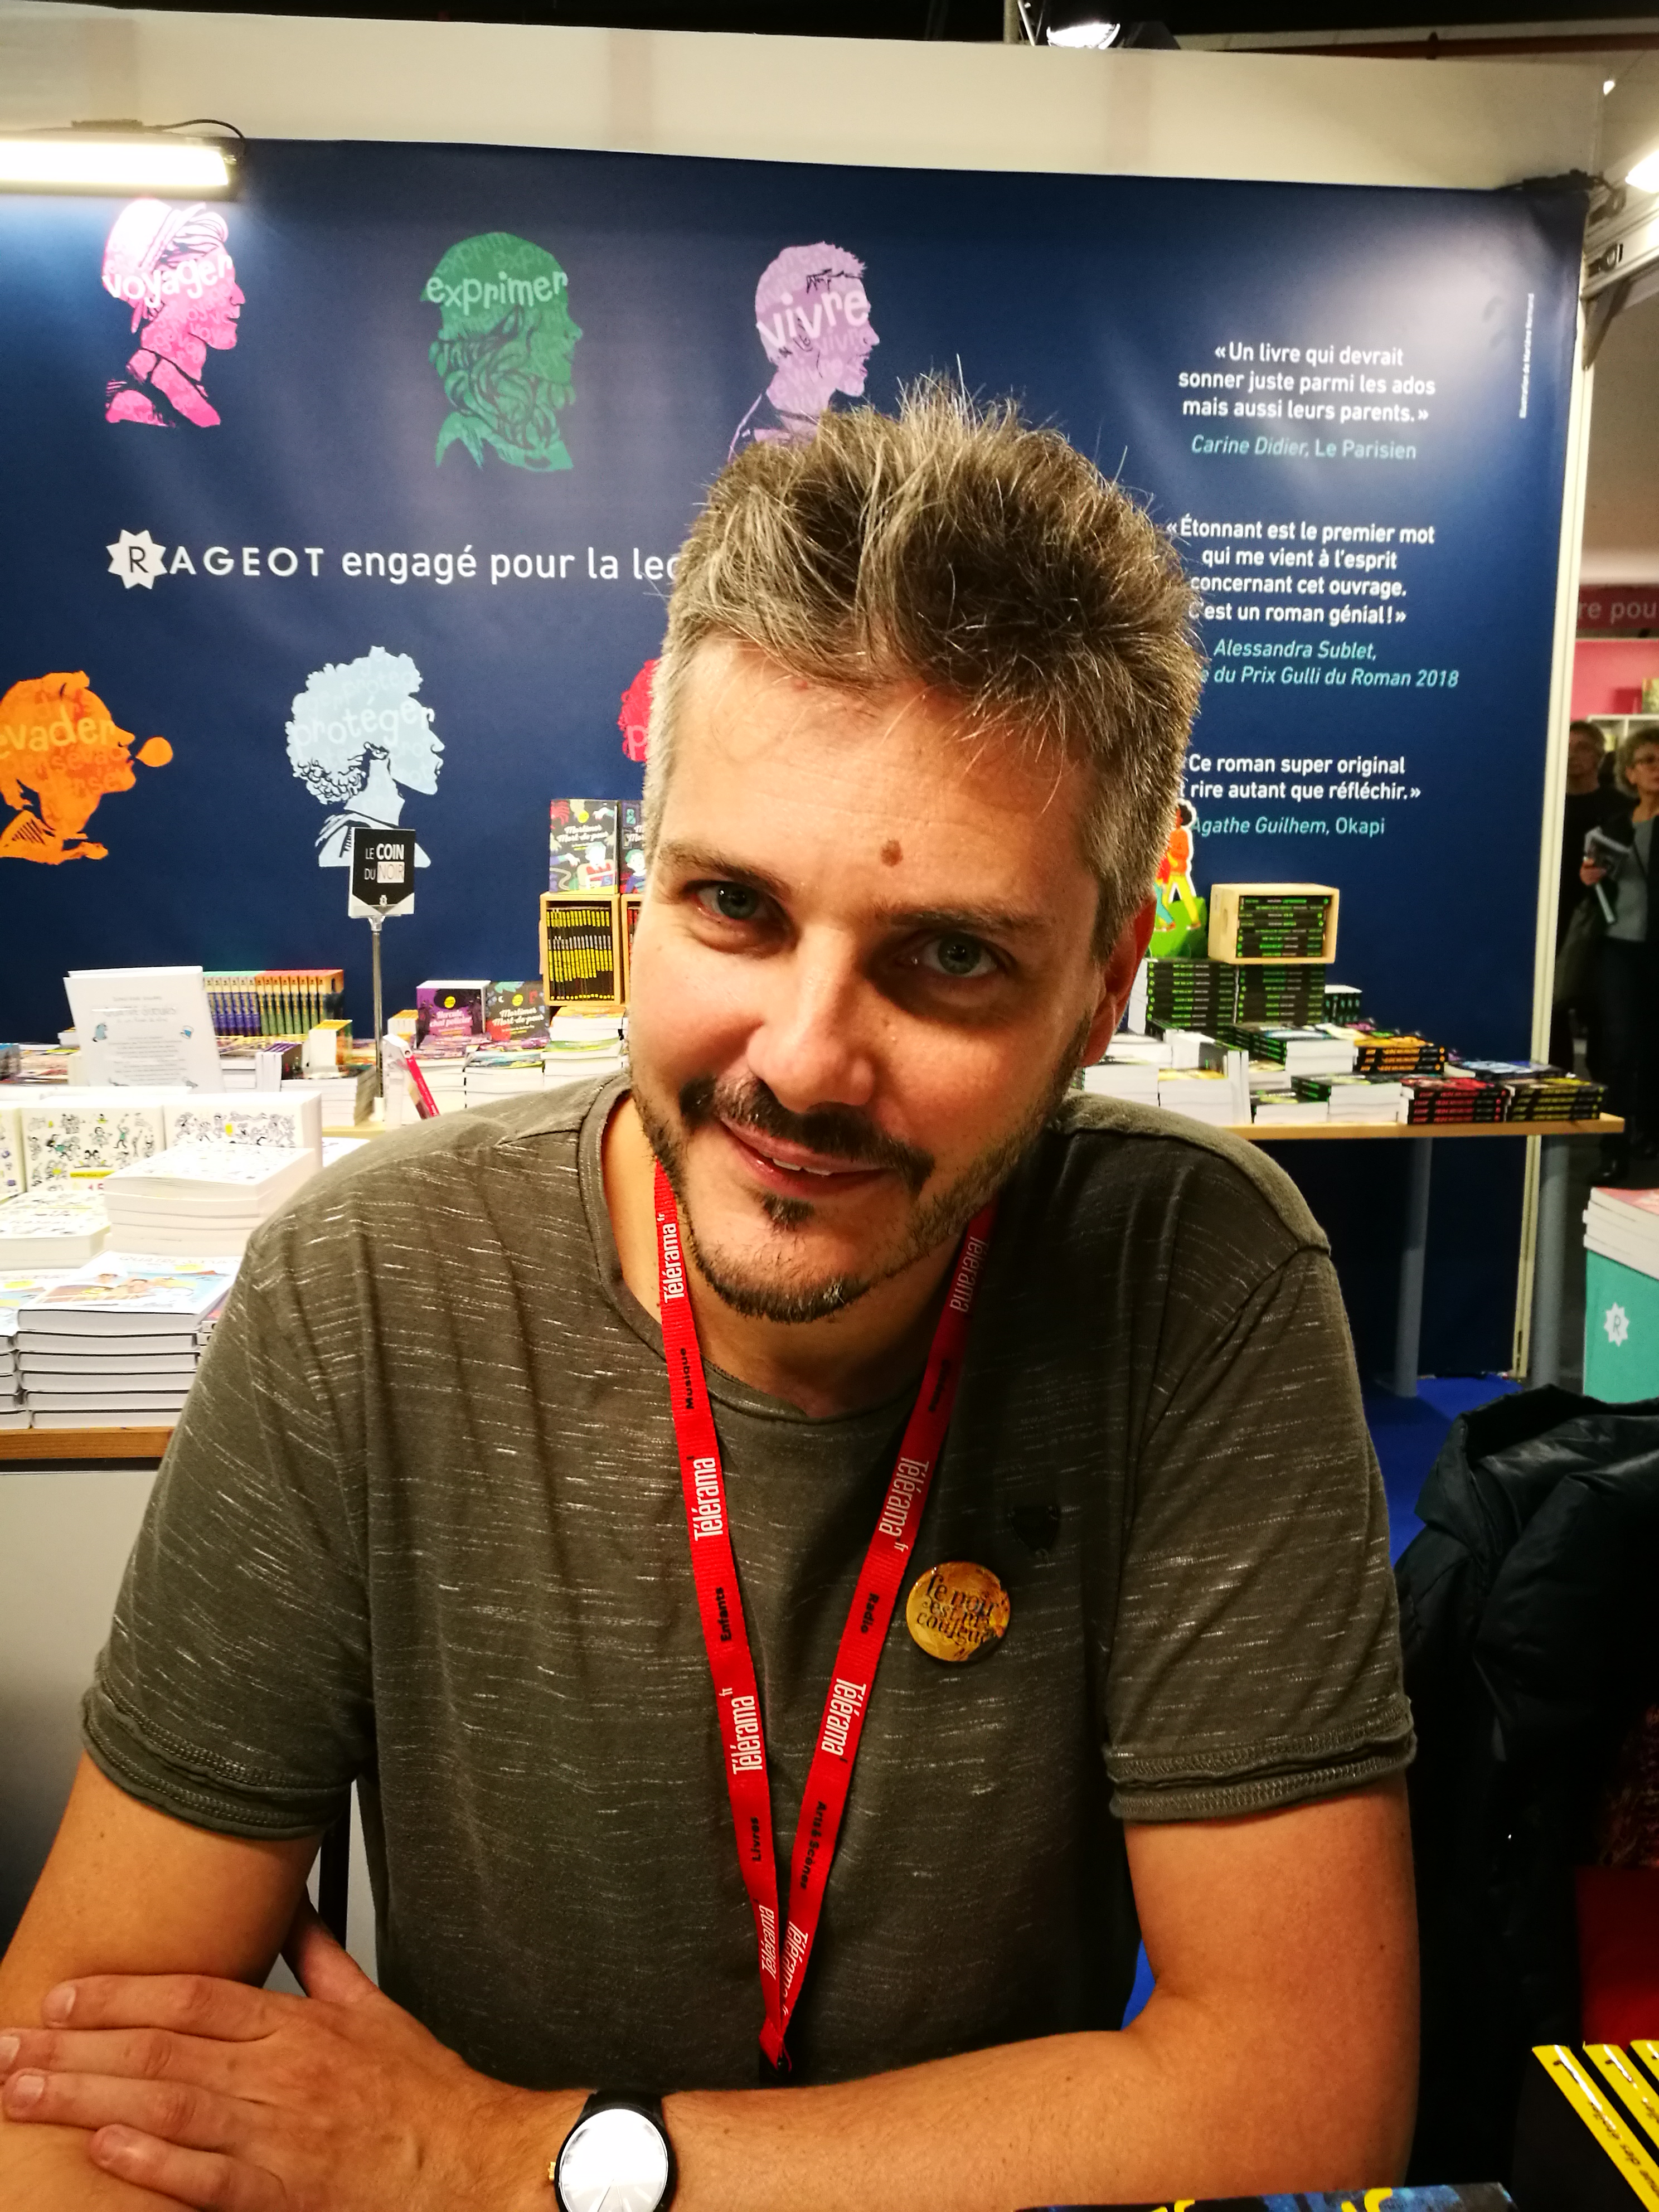 Olivier Gay Wikipedia